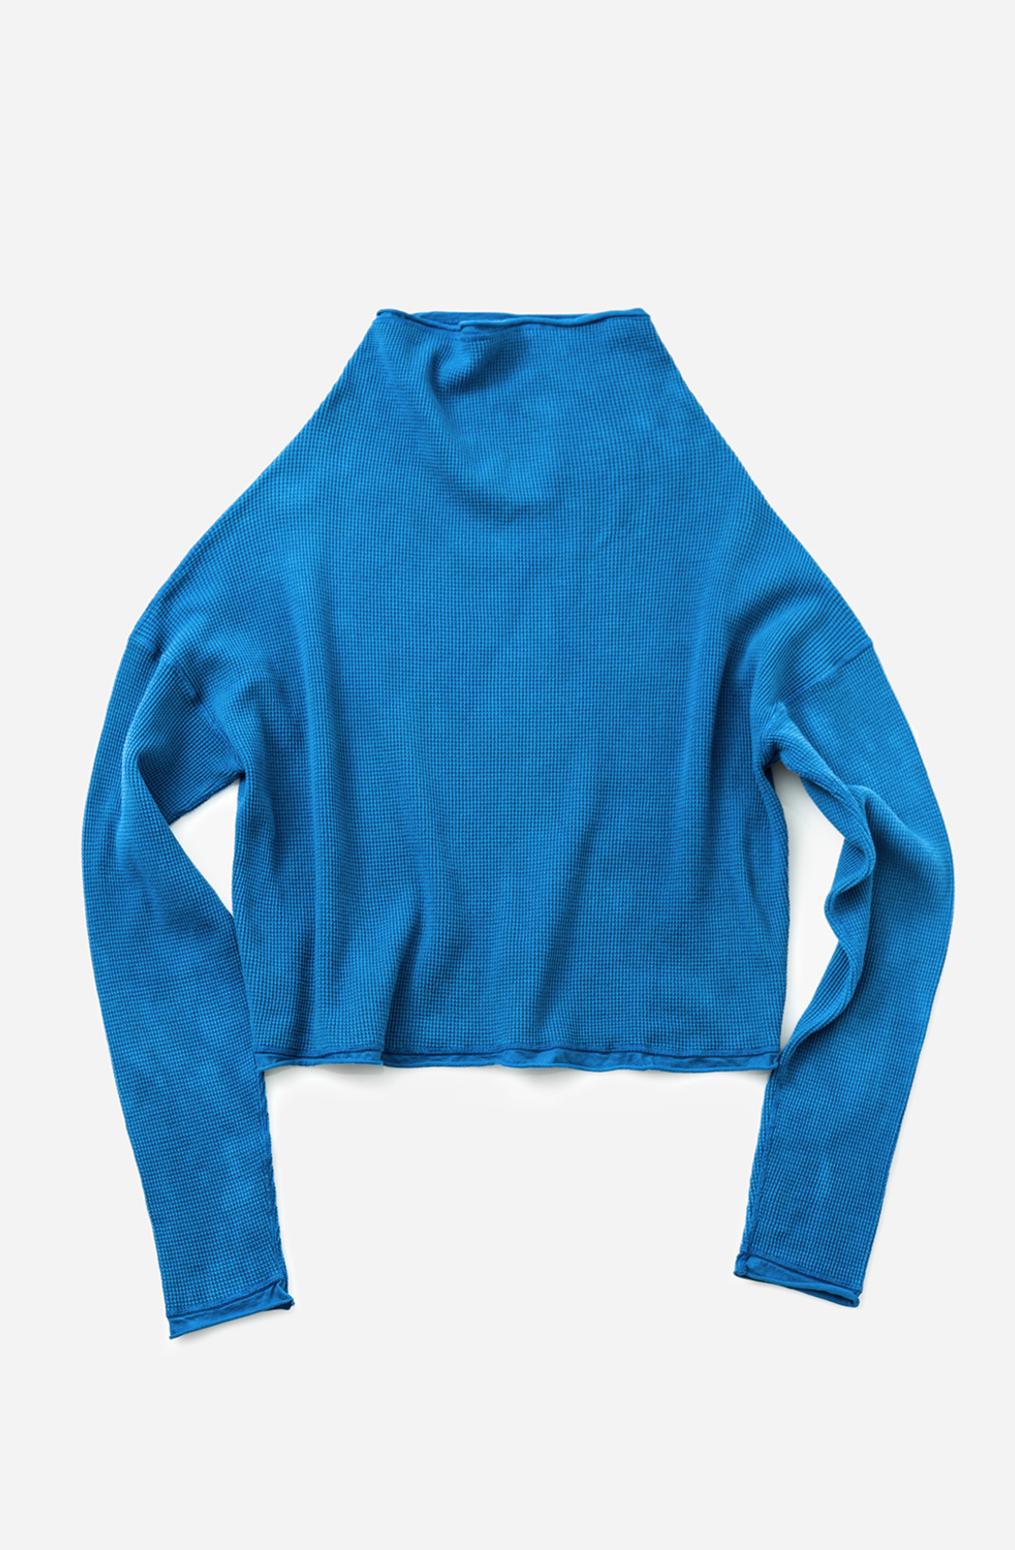 Alabama chanin waffle knit sweatshirt summer style